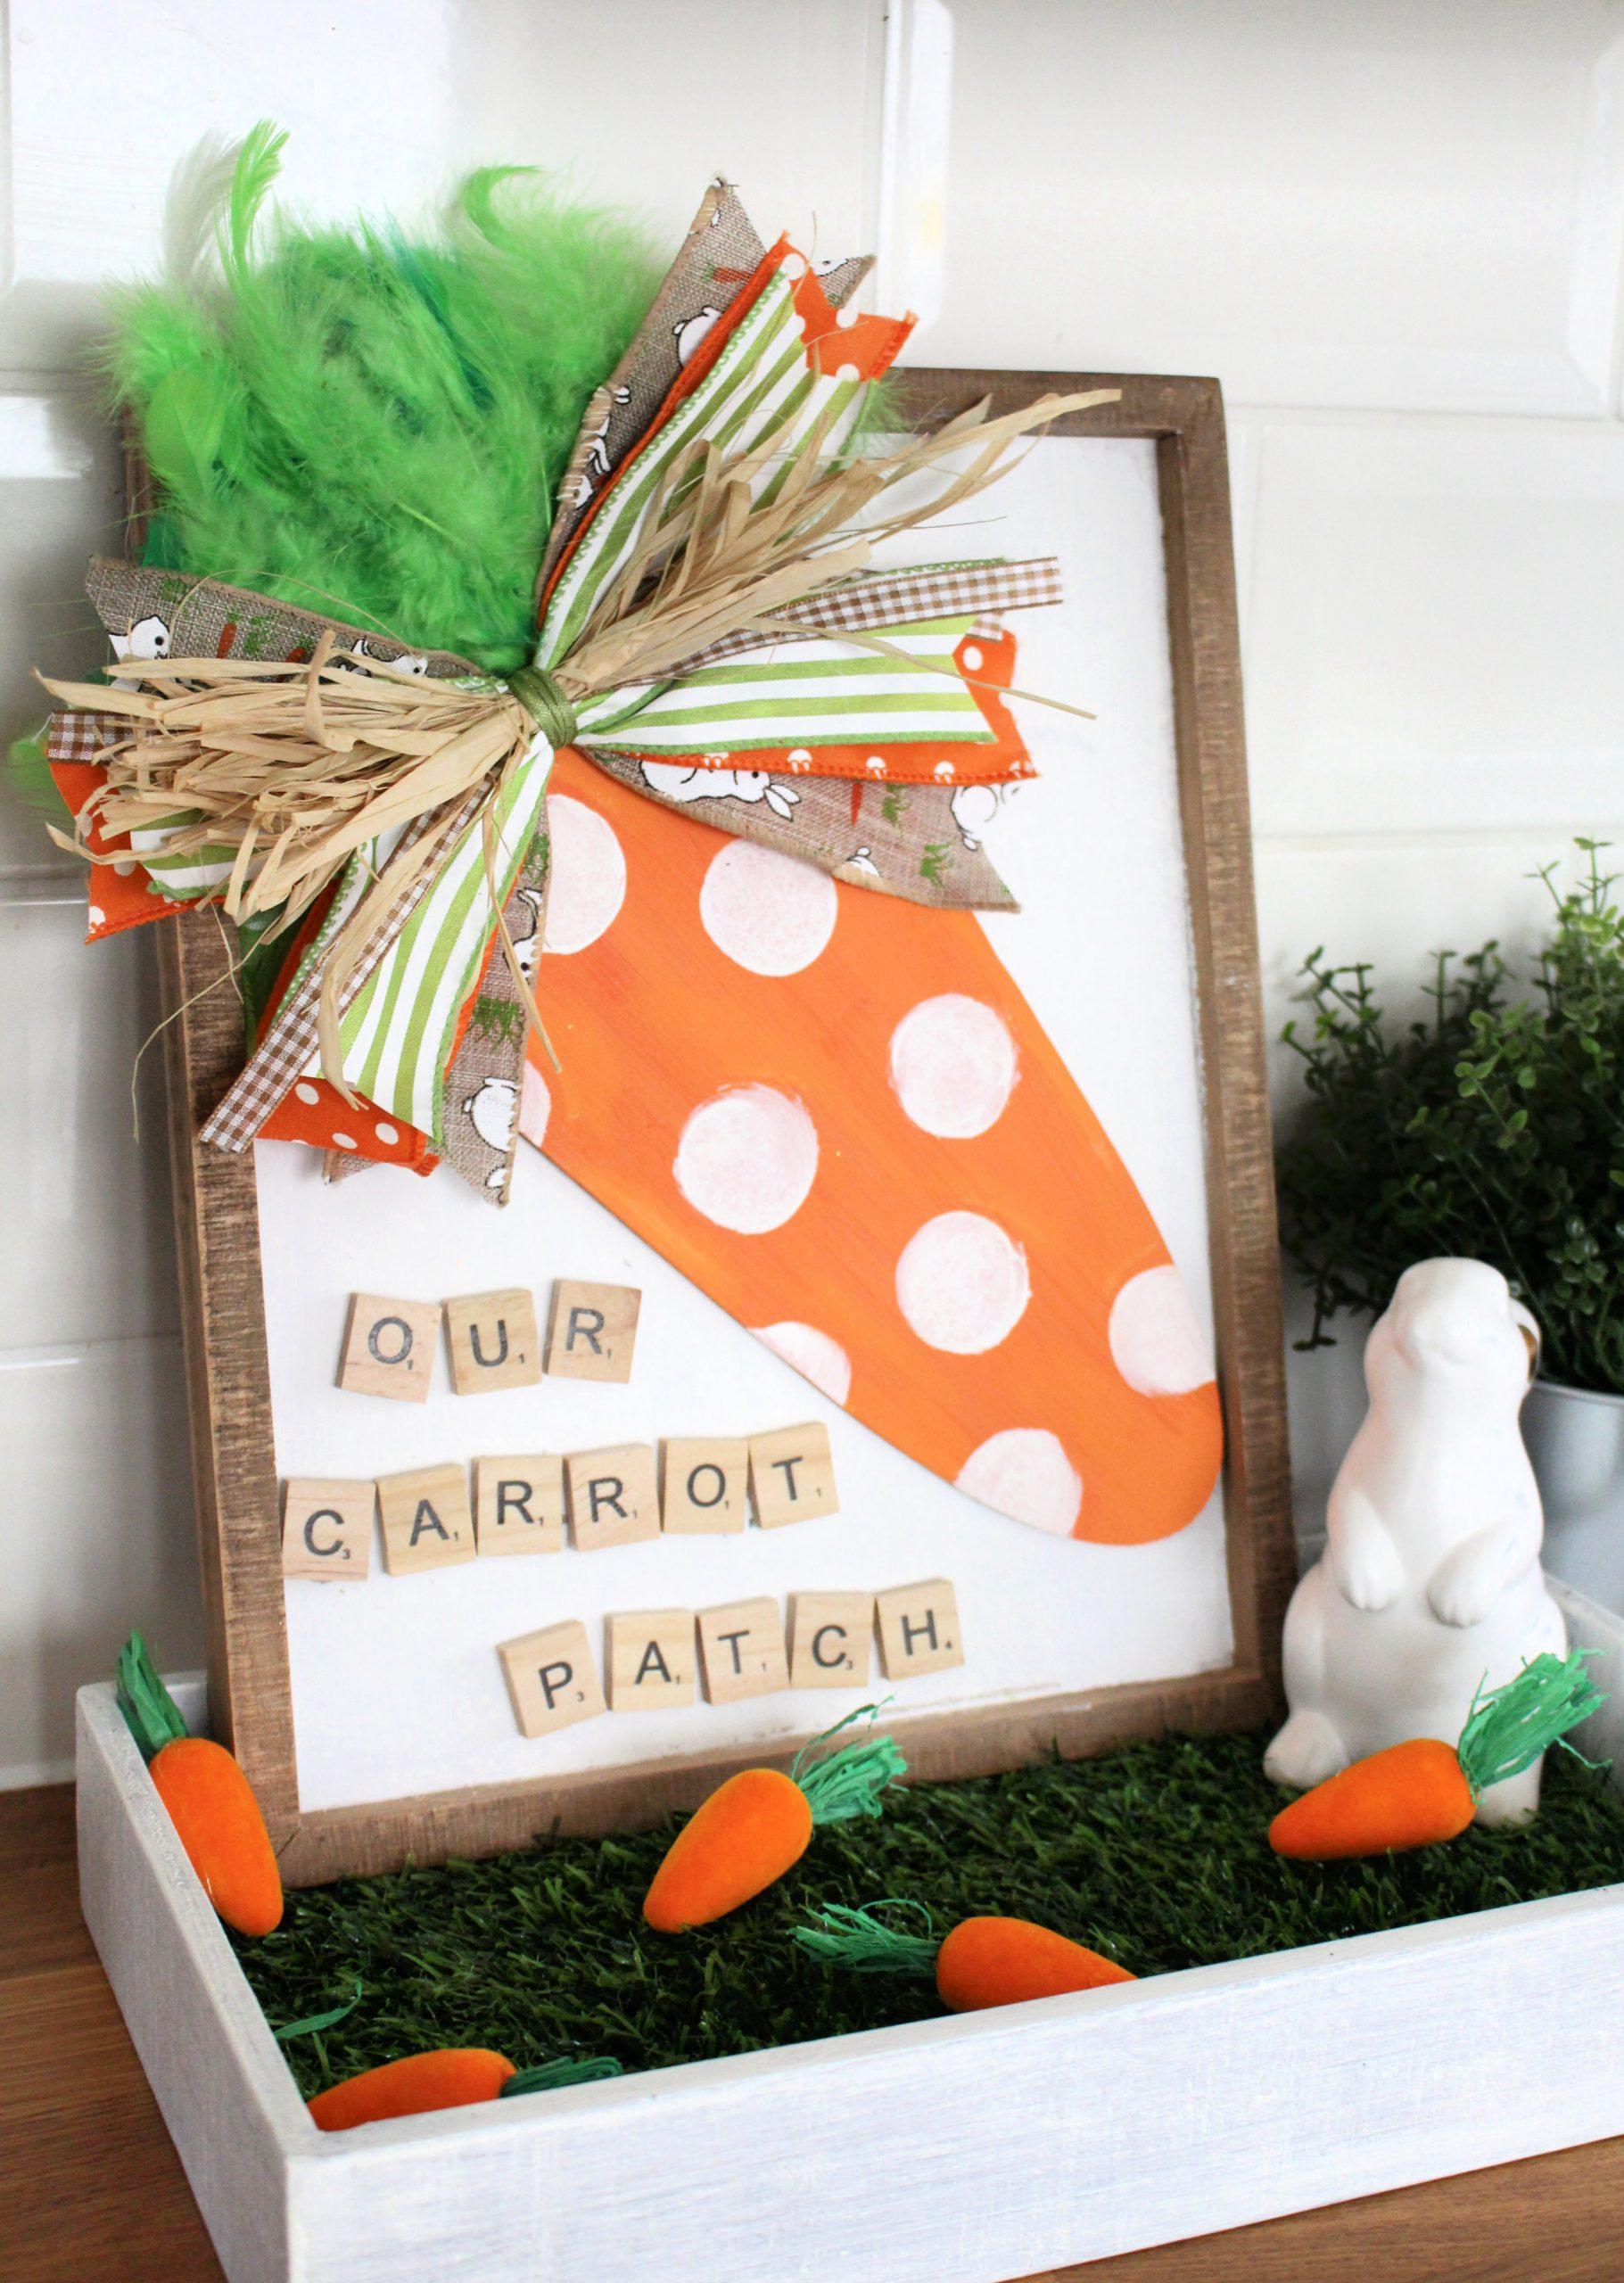 Hobbycraft Carrot Patch sign